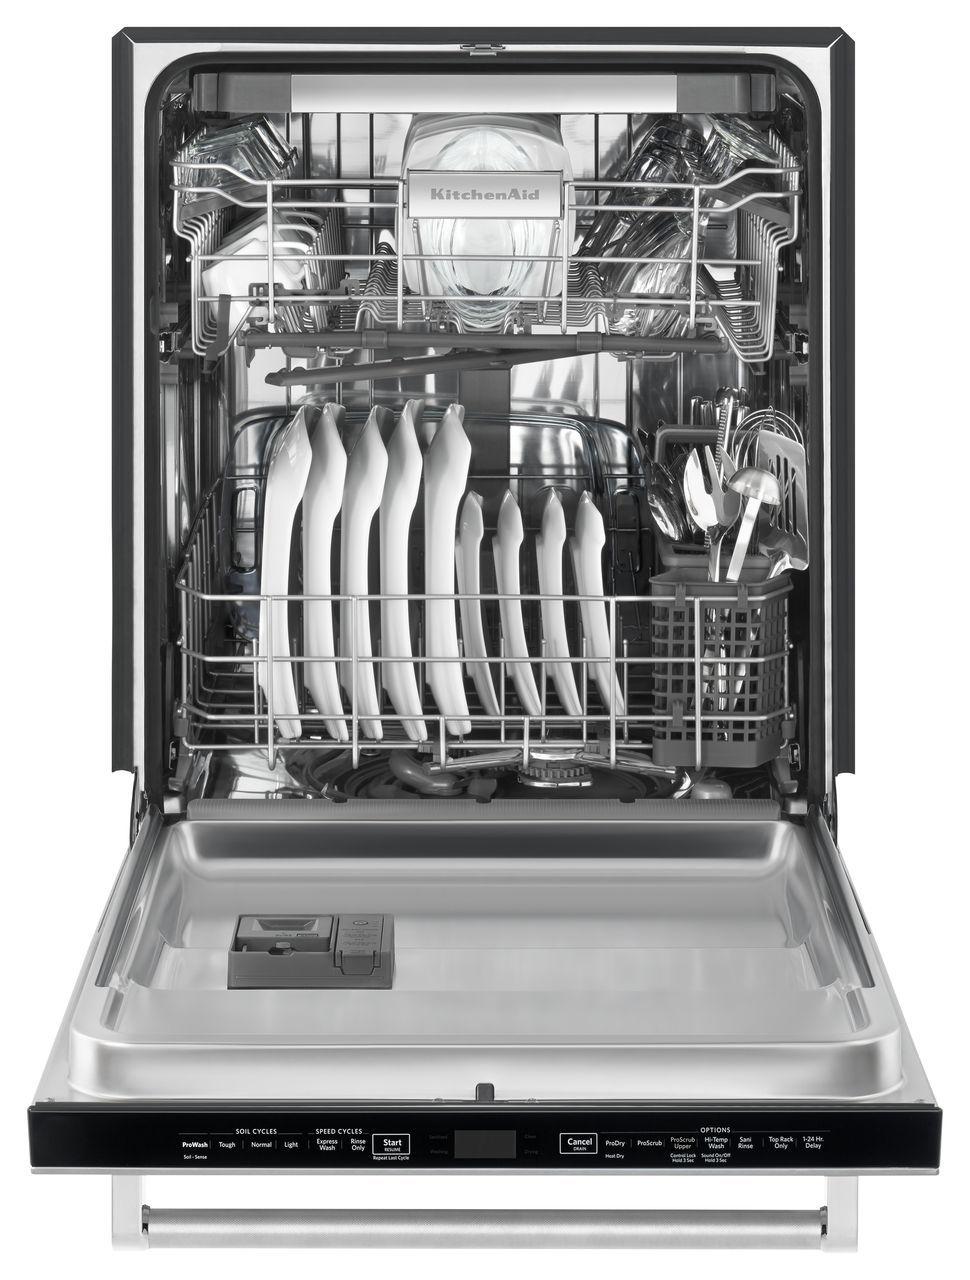 Kitchenaid Built In Stainless Dishwasher Kdtm404ess